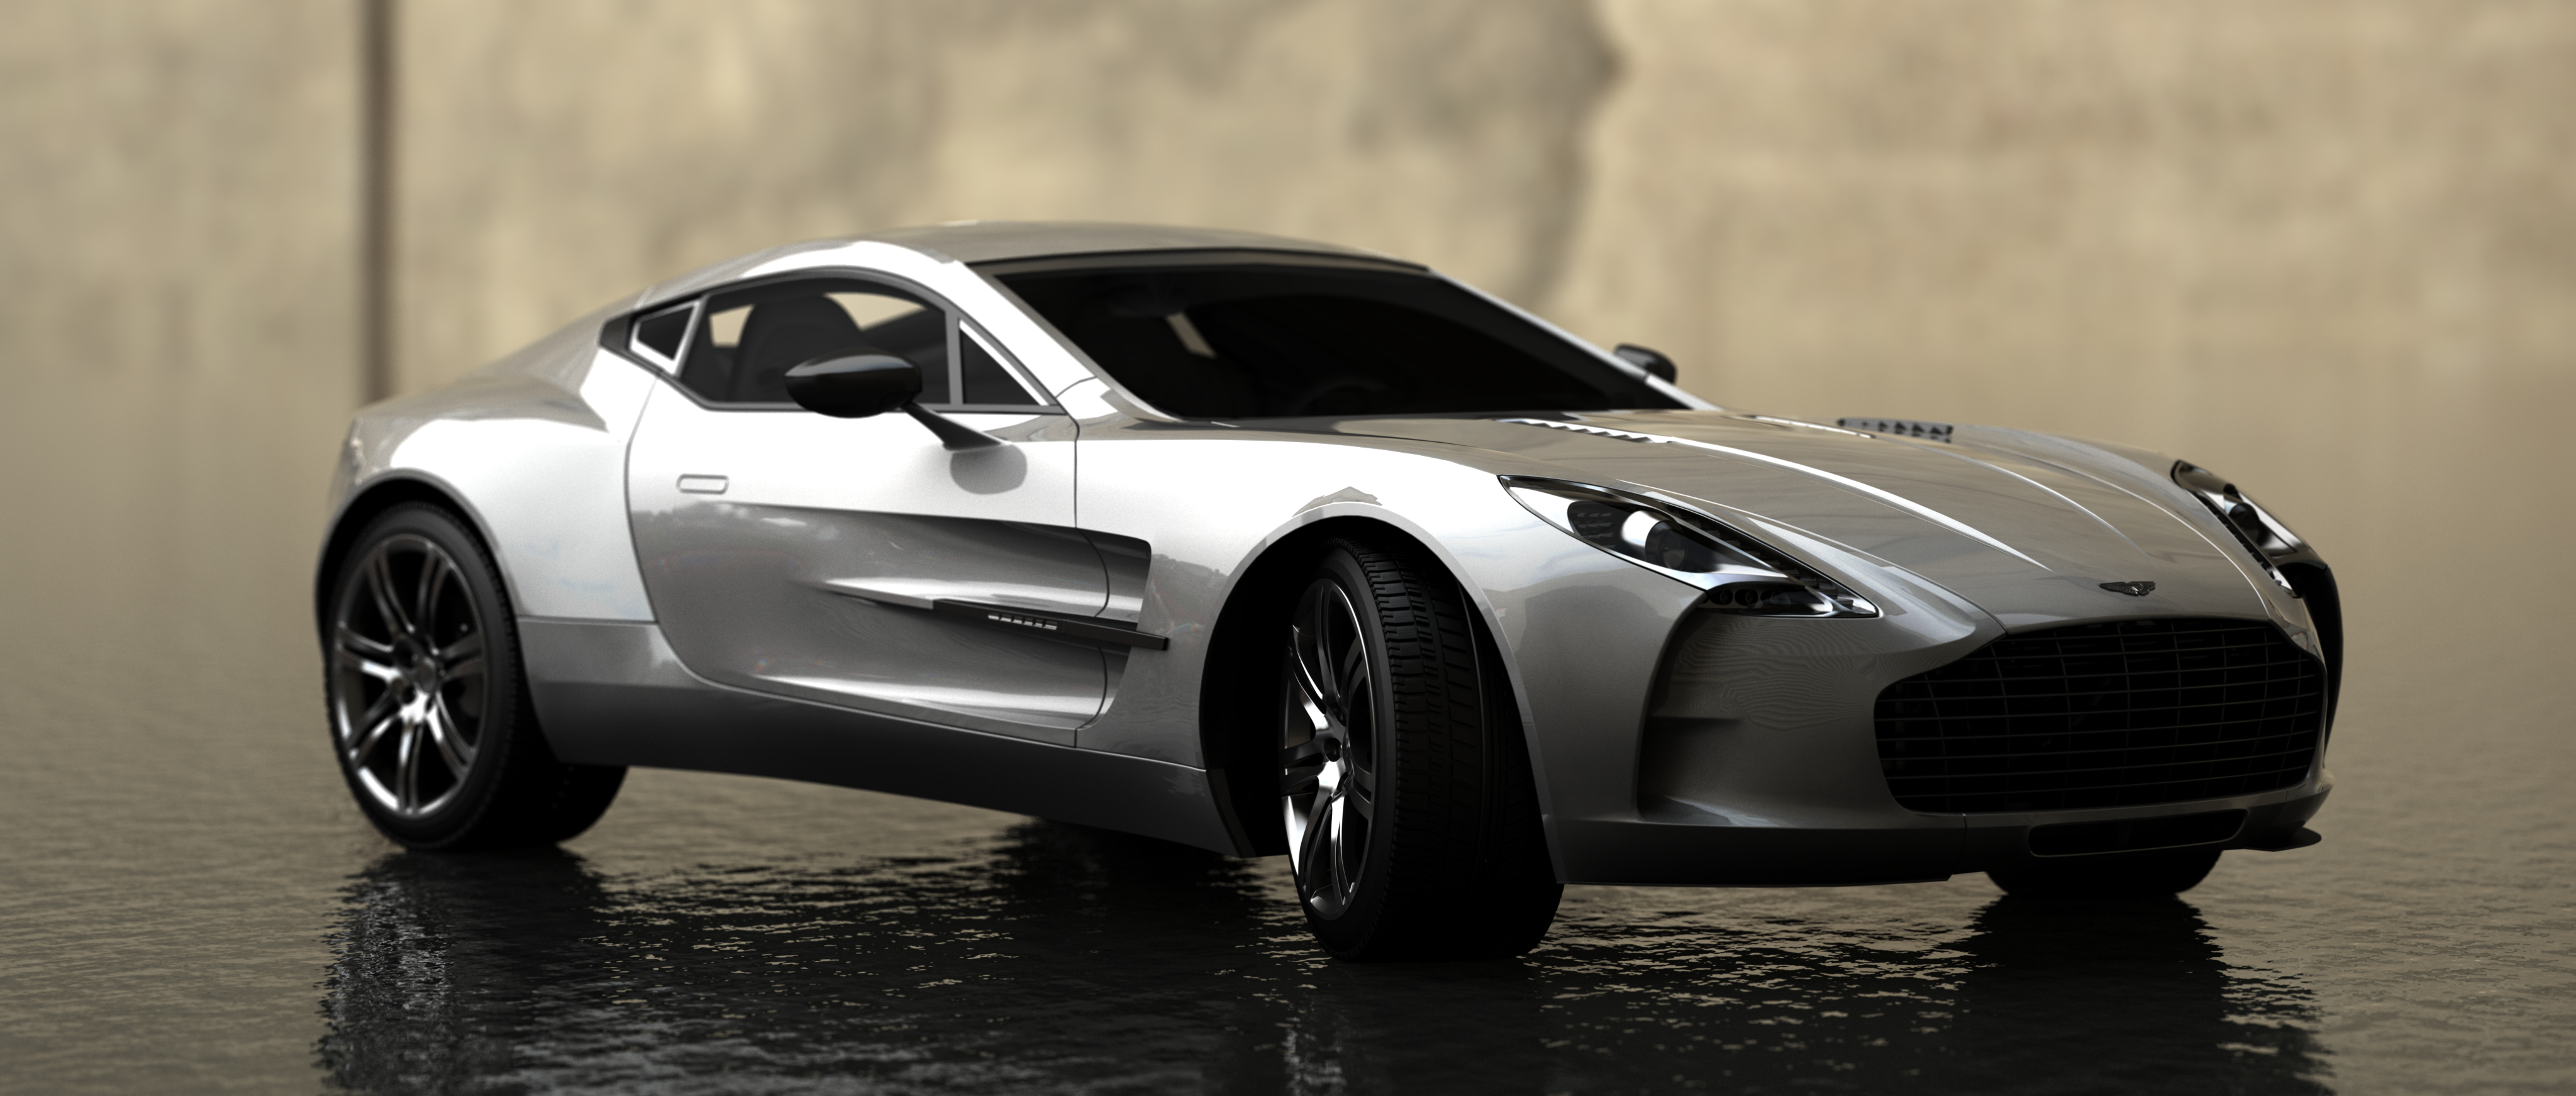 Aston Martin One 77 By Ajaxial On Deviantart